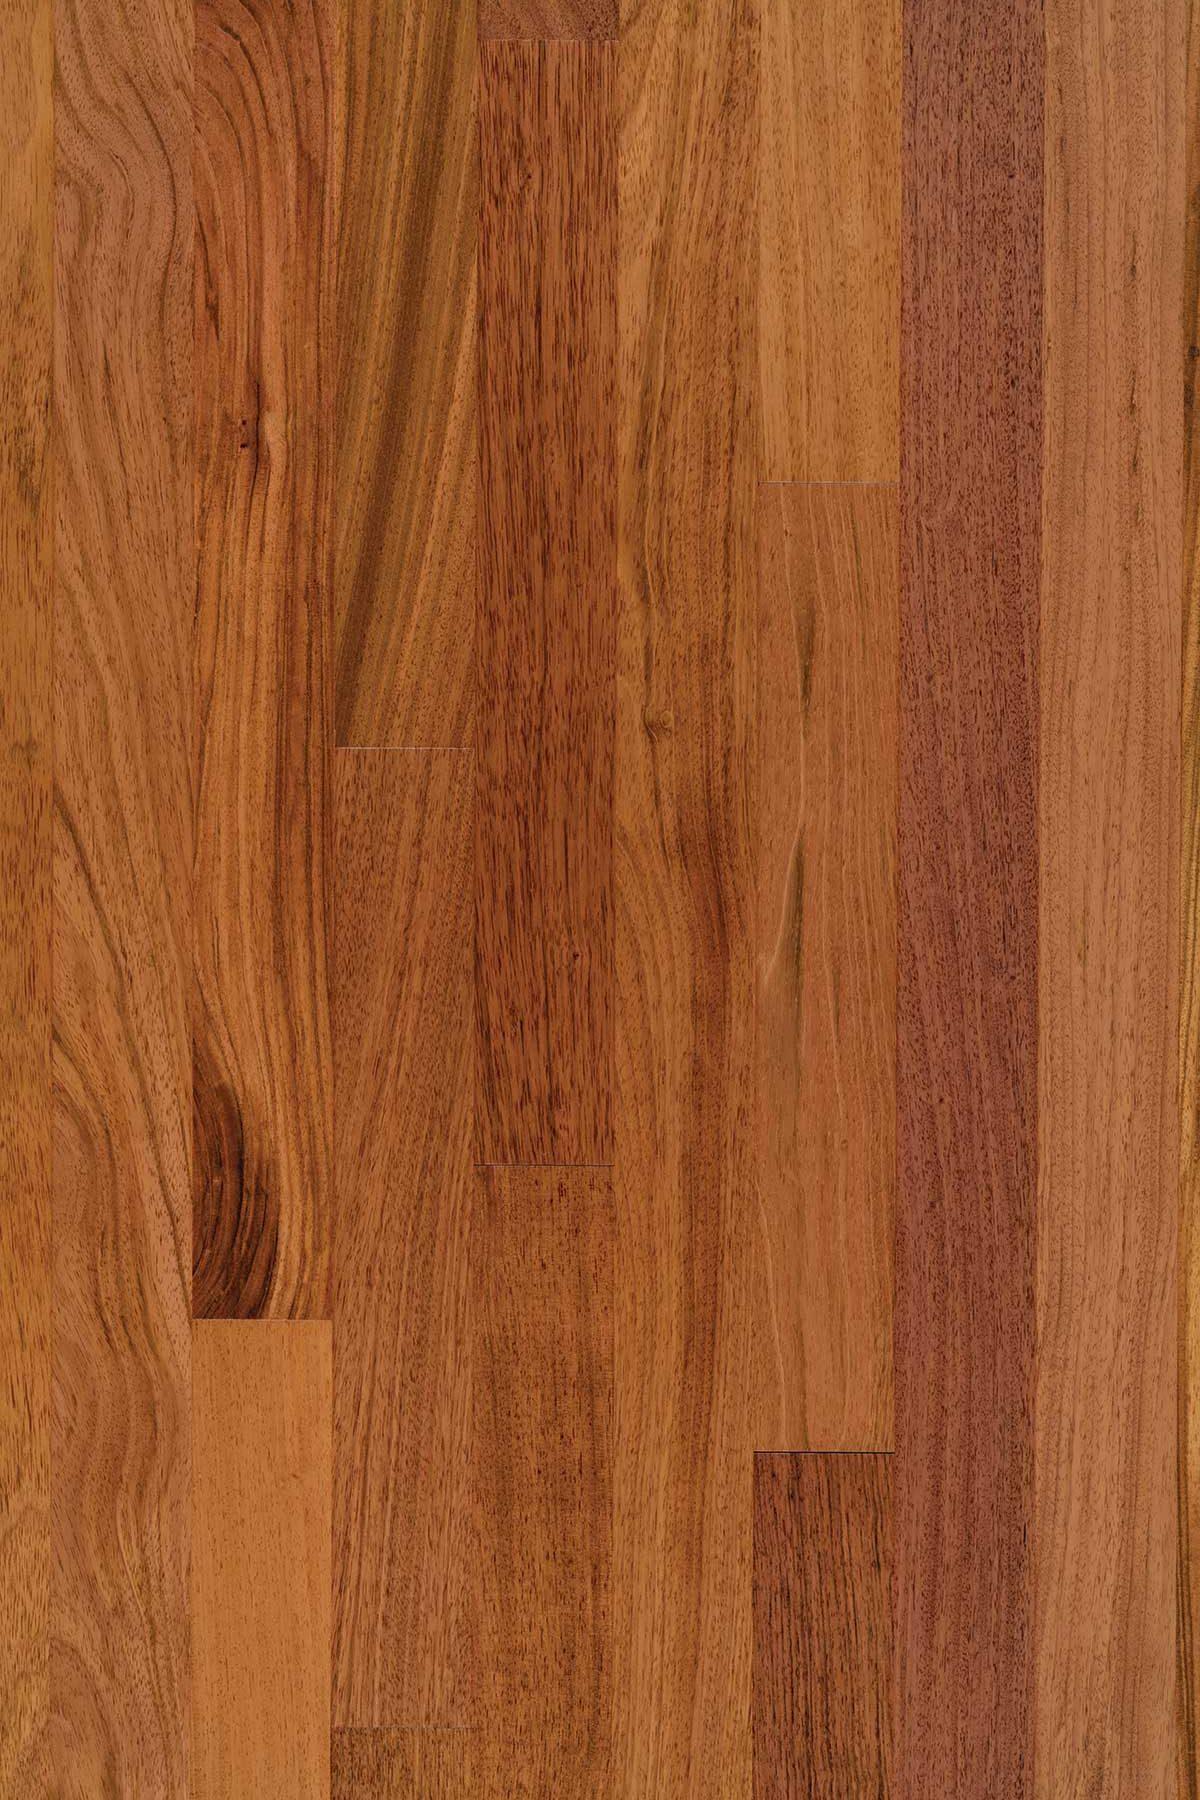 Southern Wood Flooring Dallas Designs